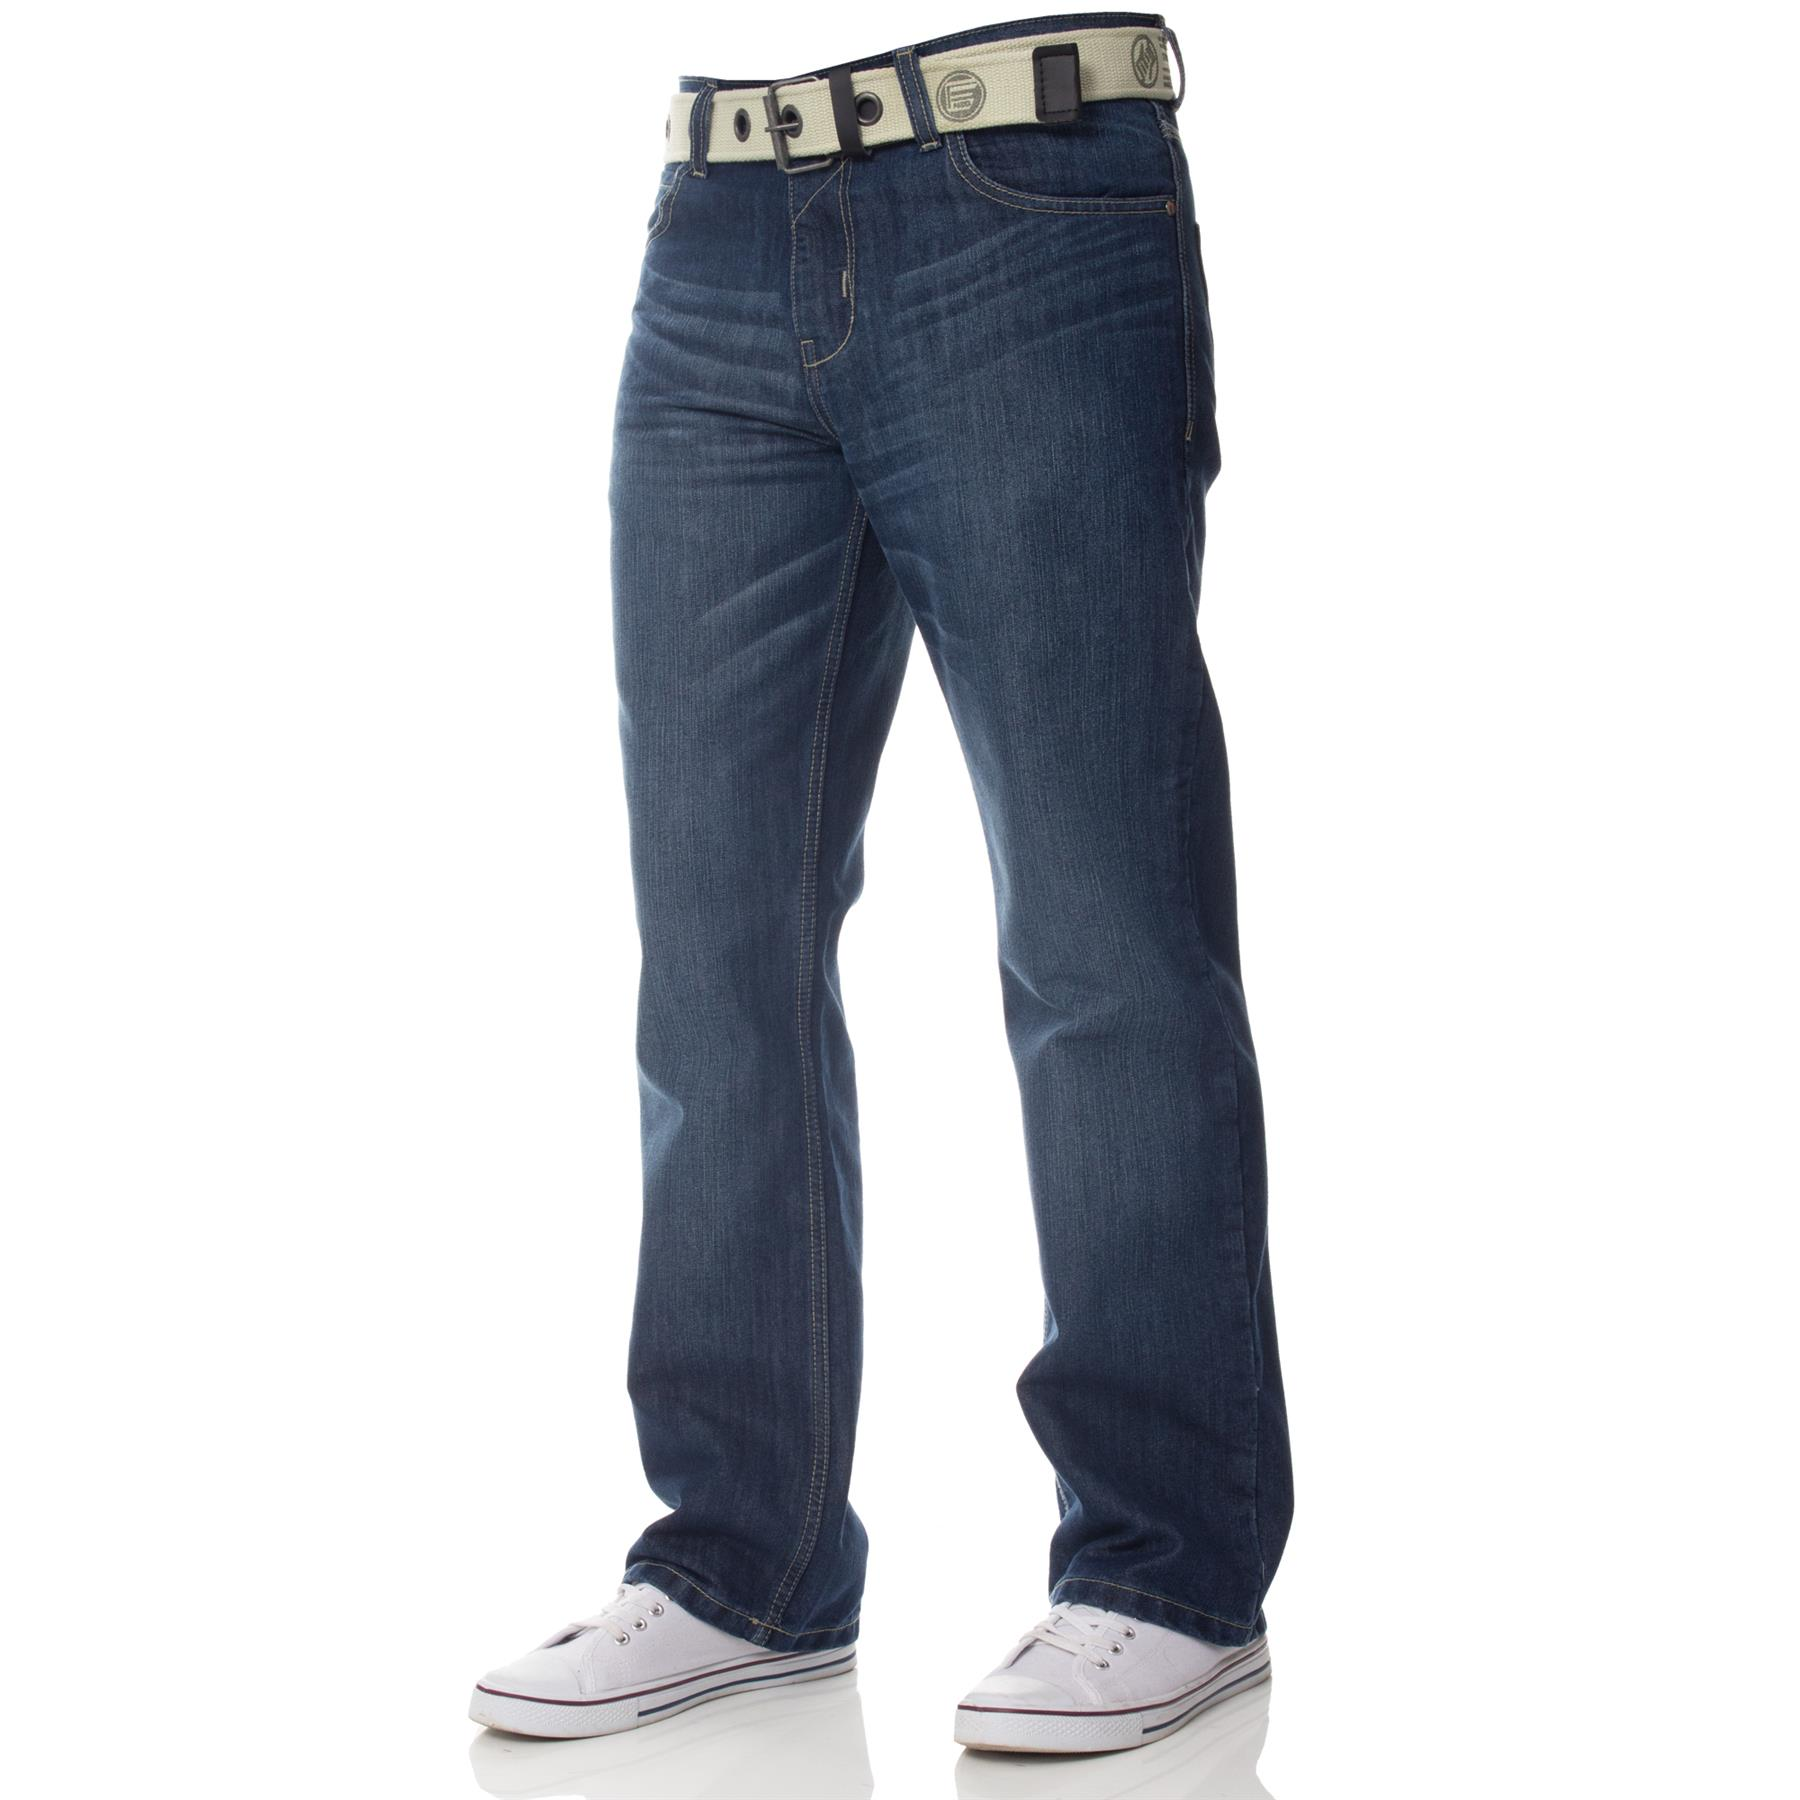 ENZO-Jeans-para-hombre-Big-Alto-Pierna-King-Size-Jeans-Pantalones-Chino-Pantalones-Pantalones-44-034 miniatura 46